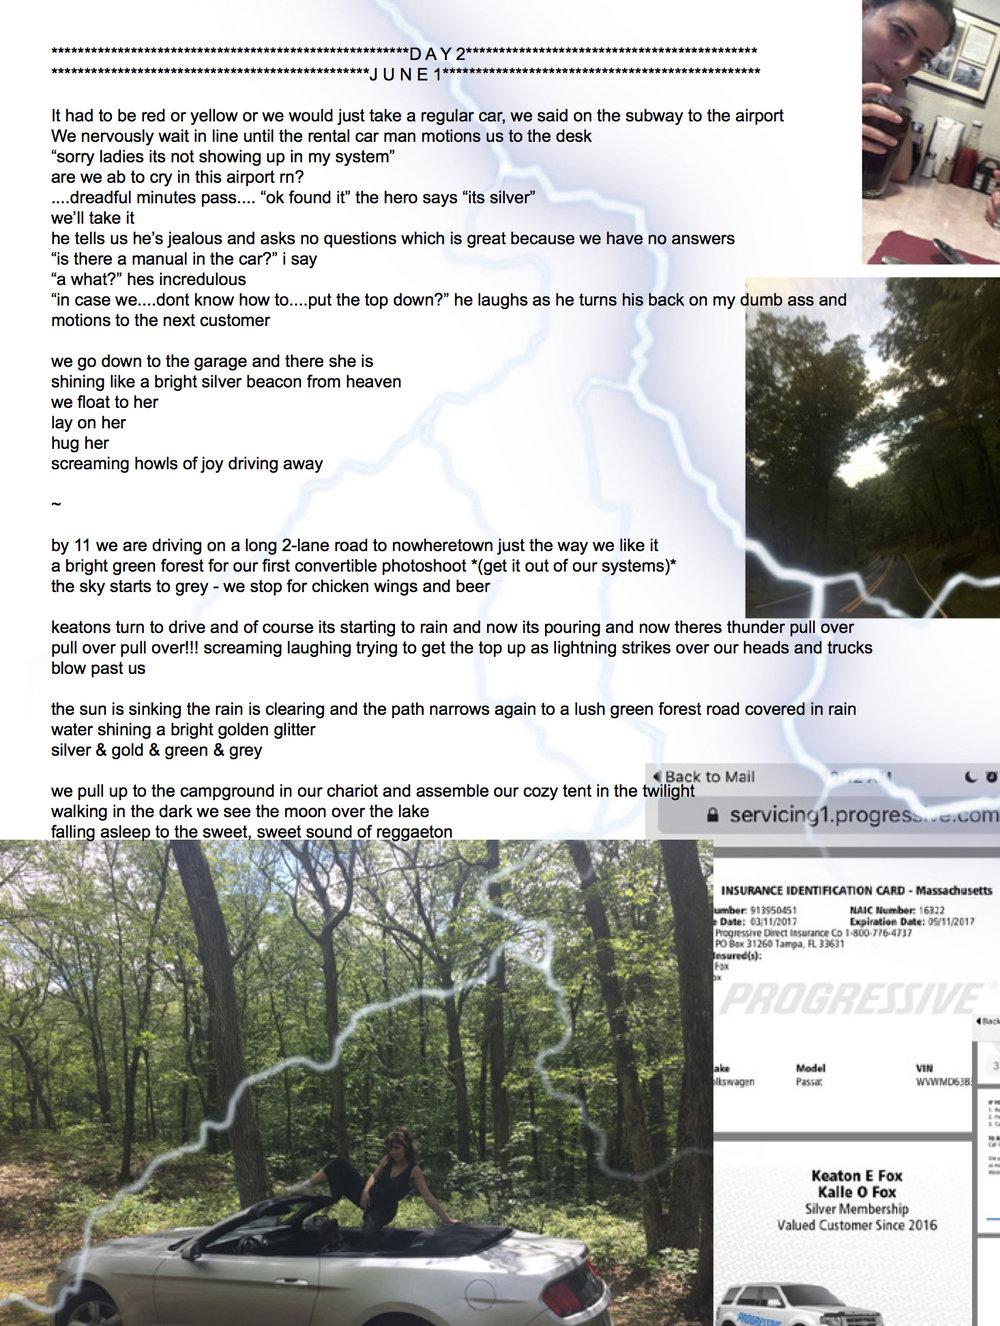 MEMORY VACATION KEATON FOX CAROLINE CASTRO 4